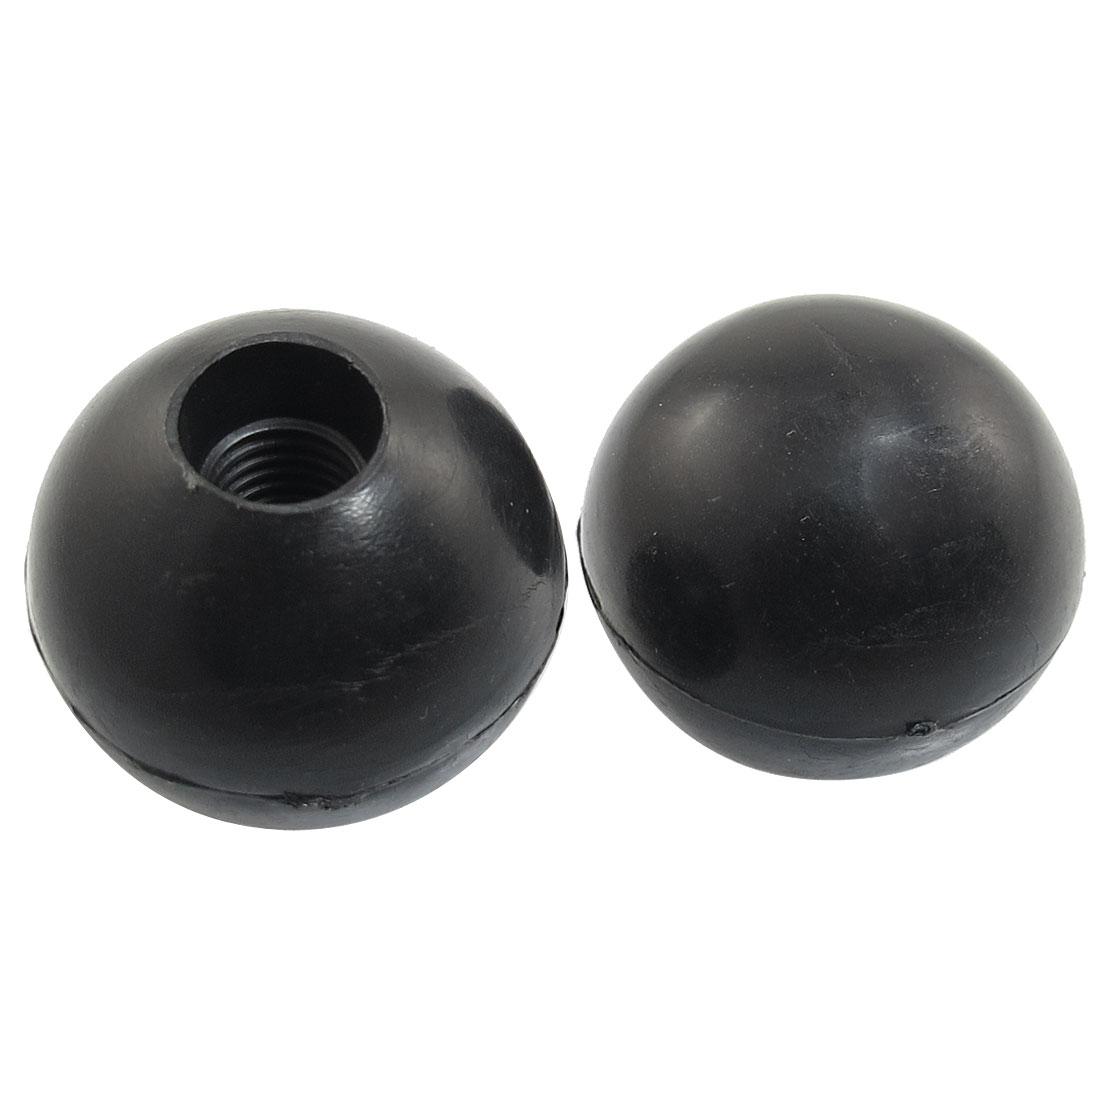 Black Plastic 10mm x 32mm Diameter Round Ball Handle Knob 2 Pcs